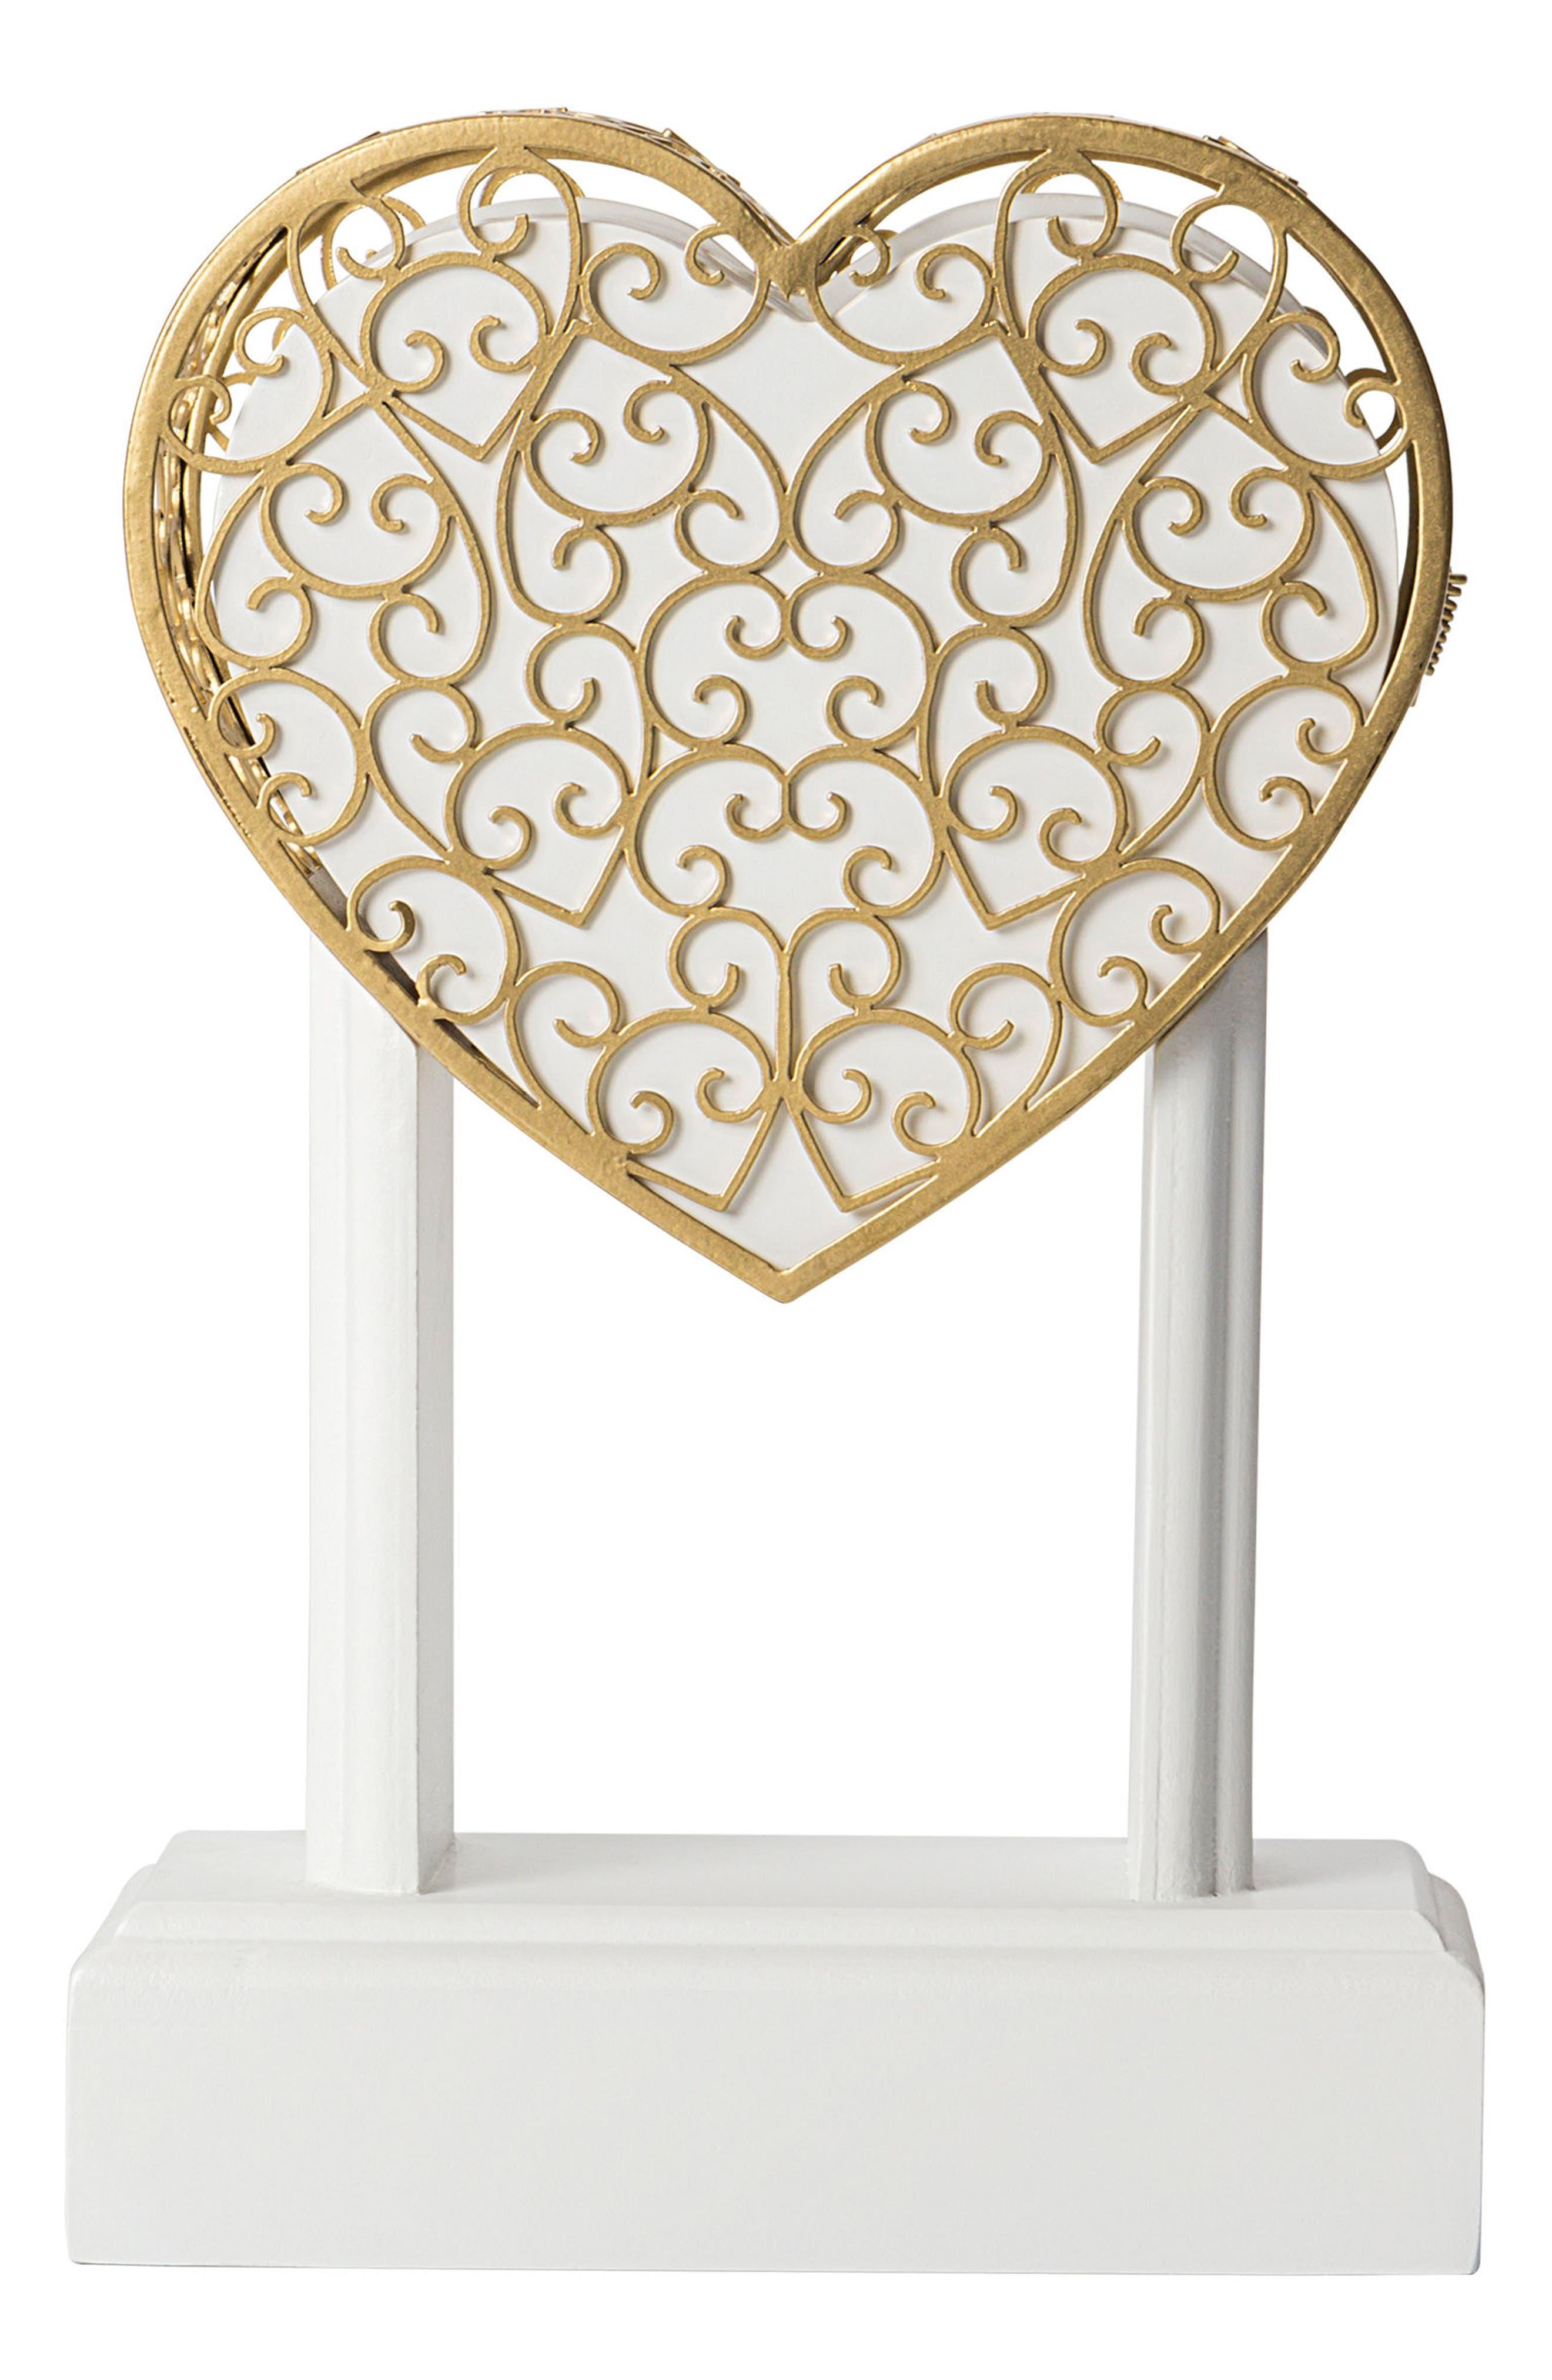 Key To My Heart Monogram Vow Unity Keepsake Box,                             Main thumbnail 1, color,                             710